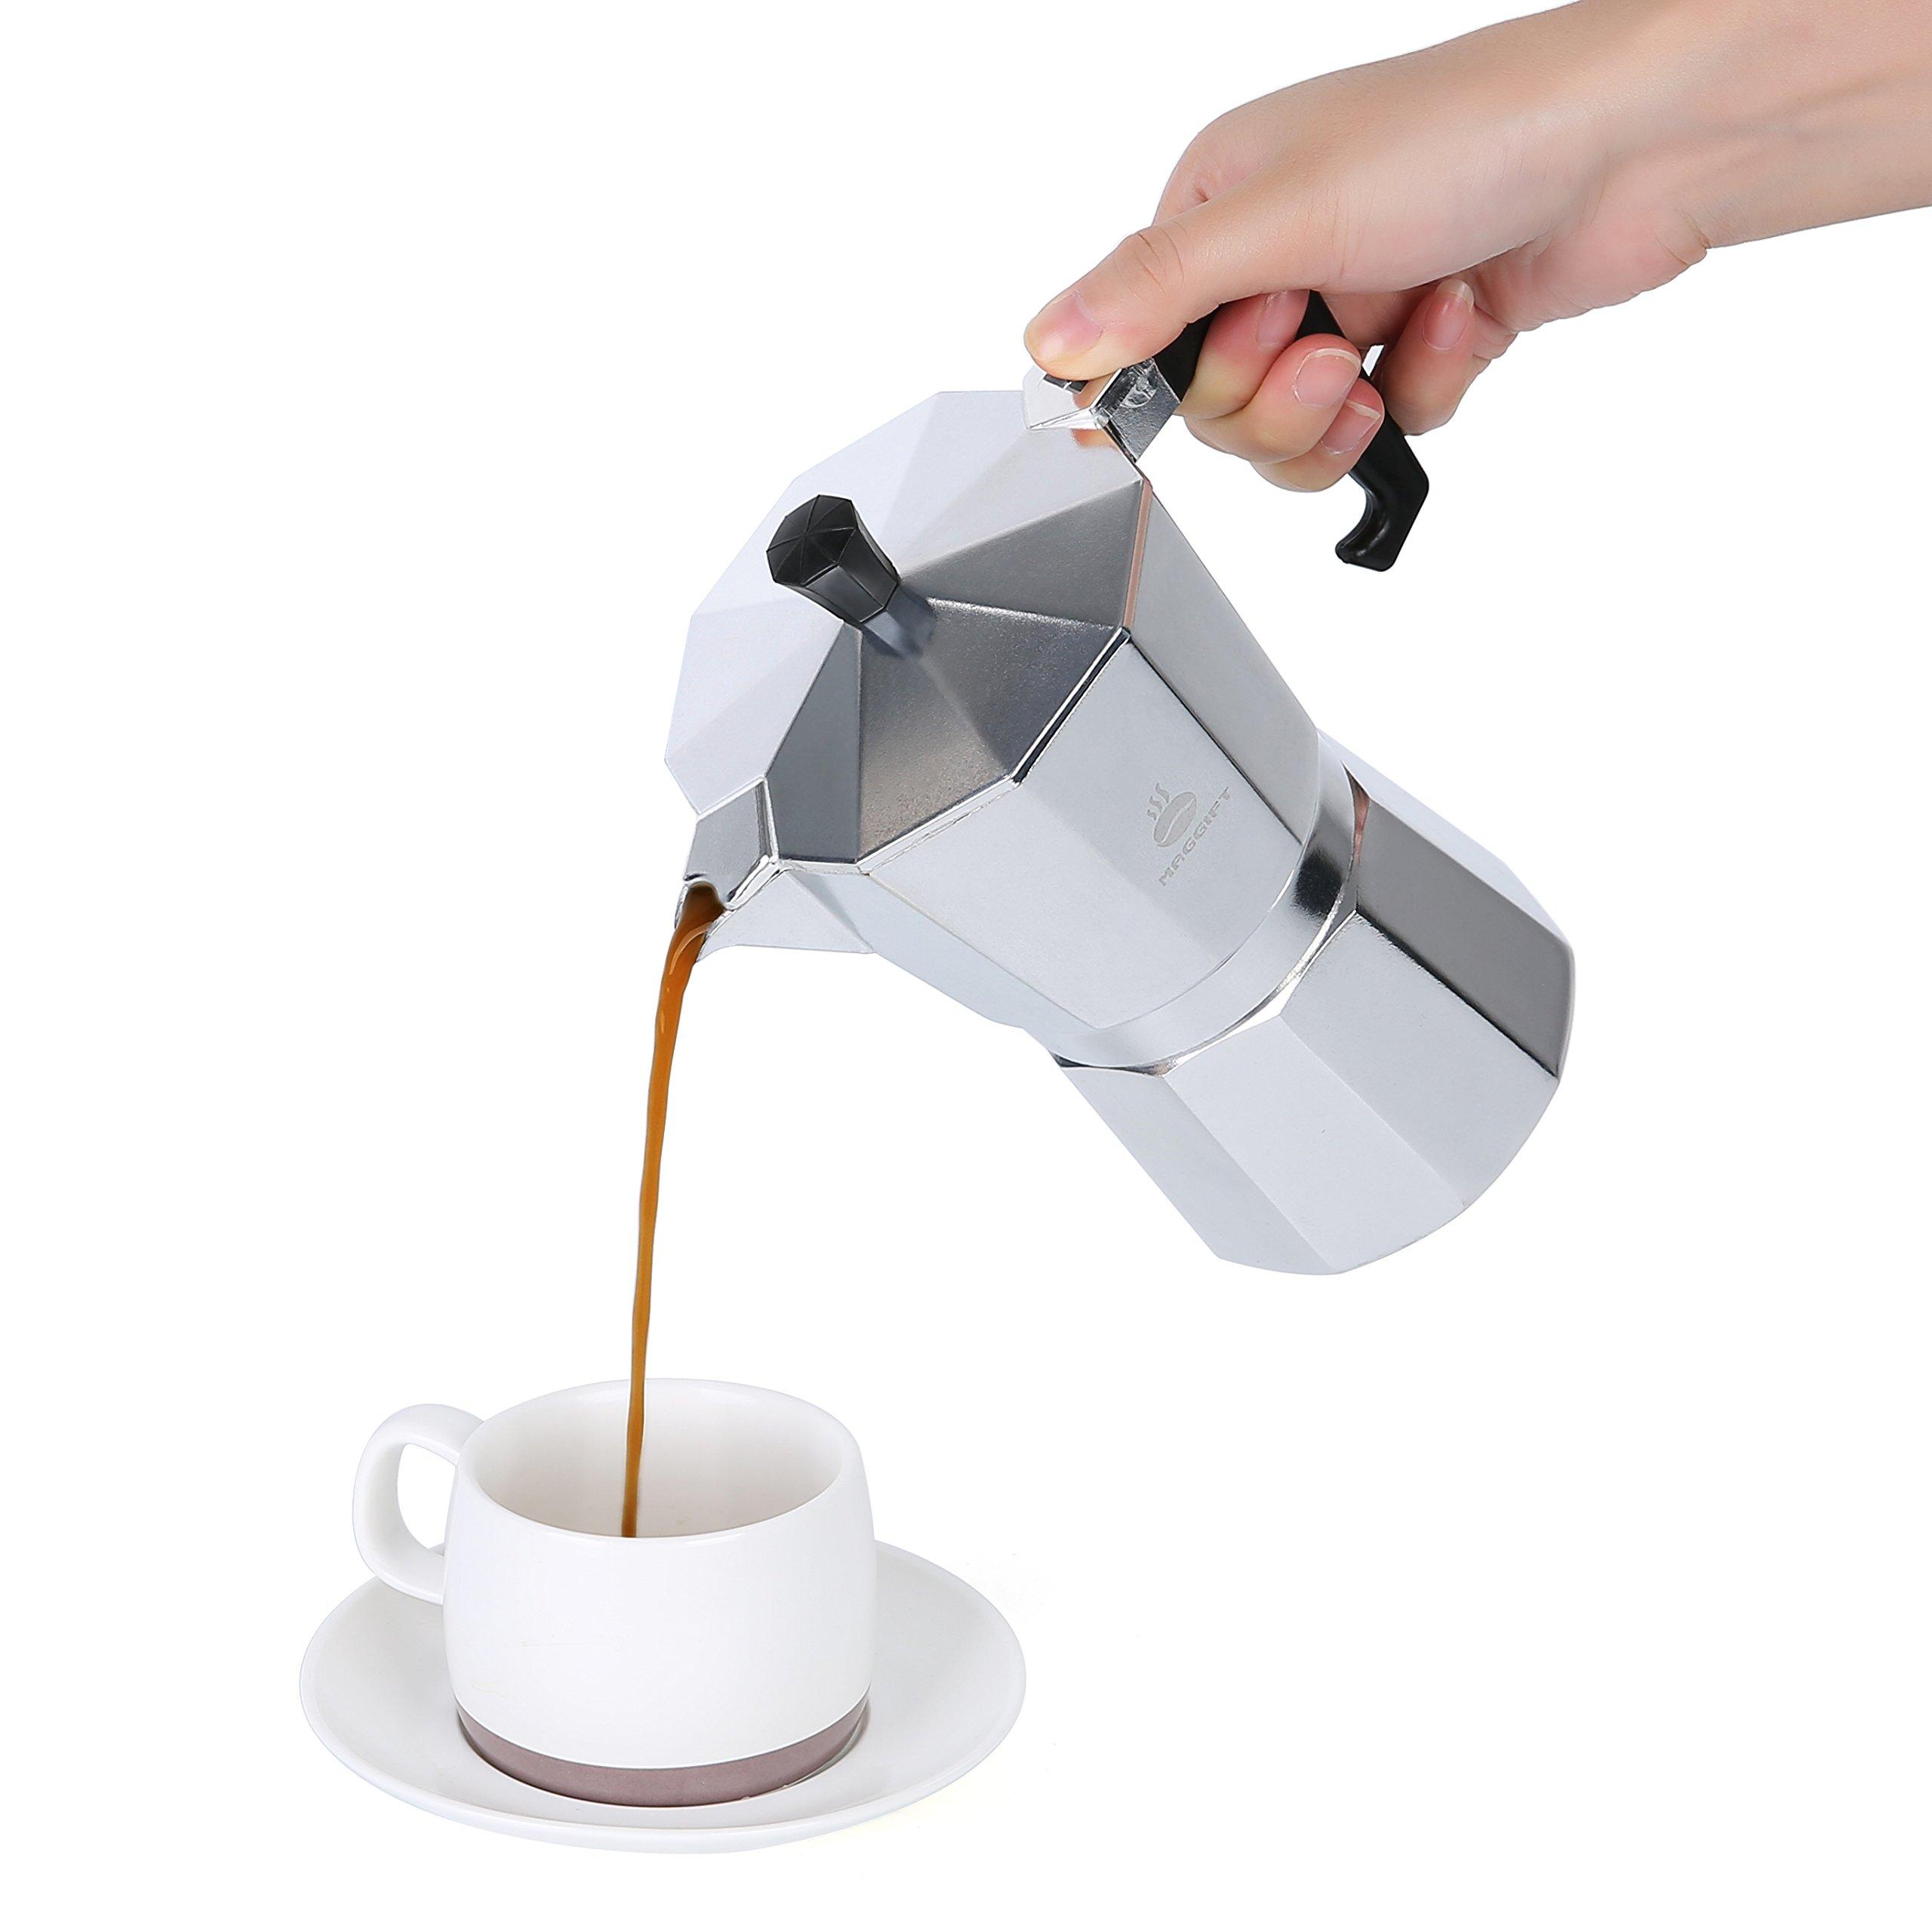 Maggift Stovetop Coffee Maker, Aluminum Italian Moka Pot (6 Cup) by Maggift (Image #4)